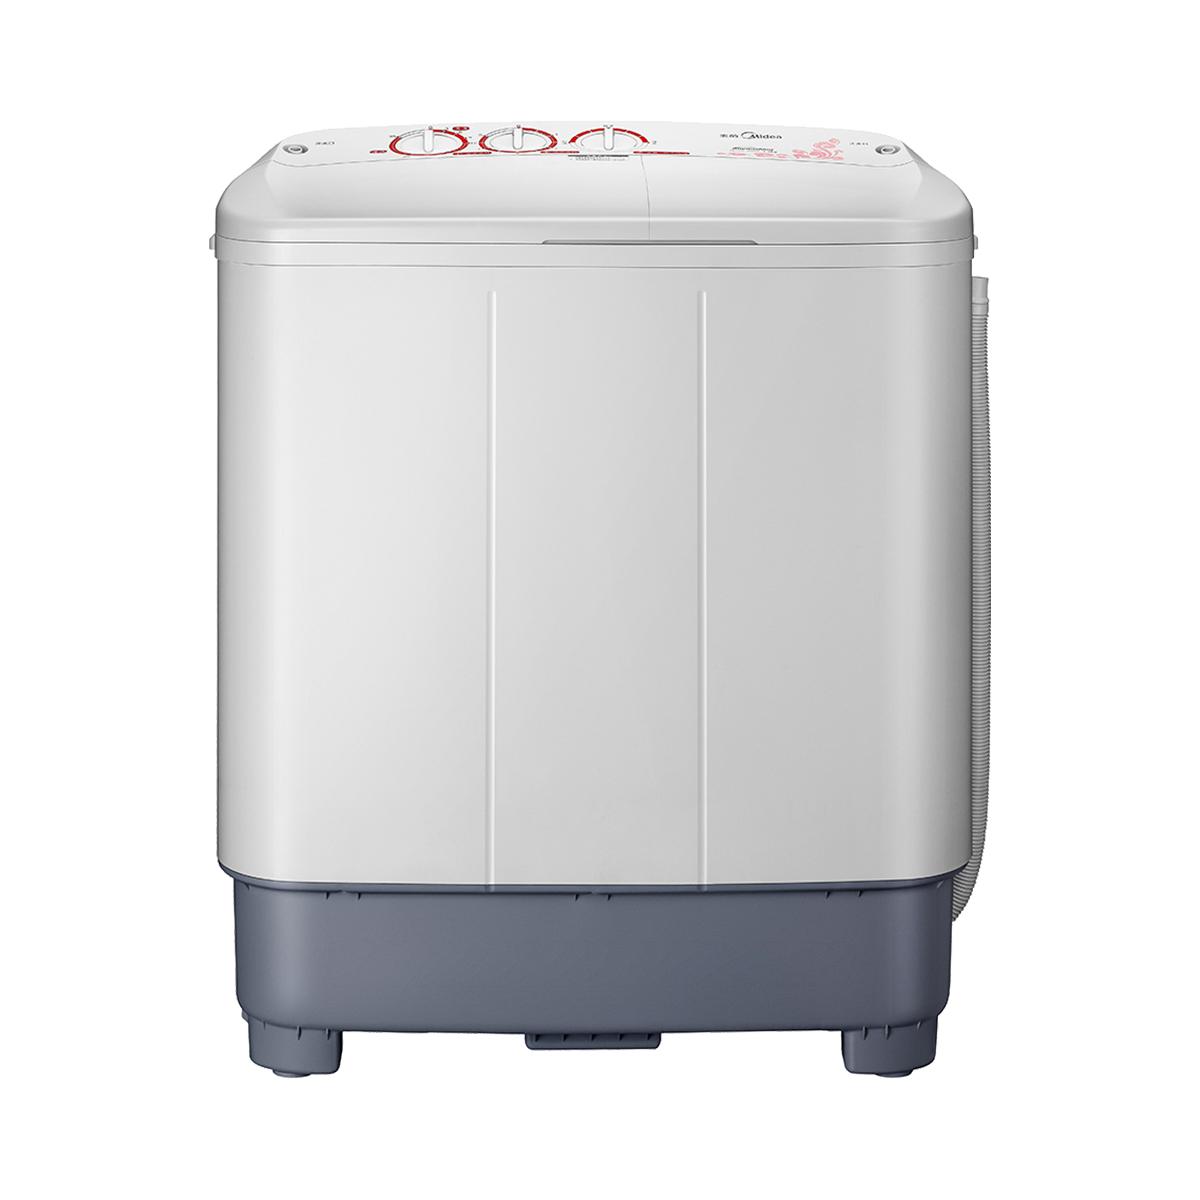 Midea/美的 MP80-V606洗衣机 说明书.pdf